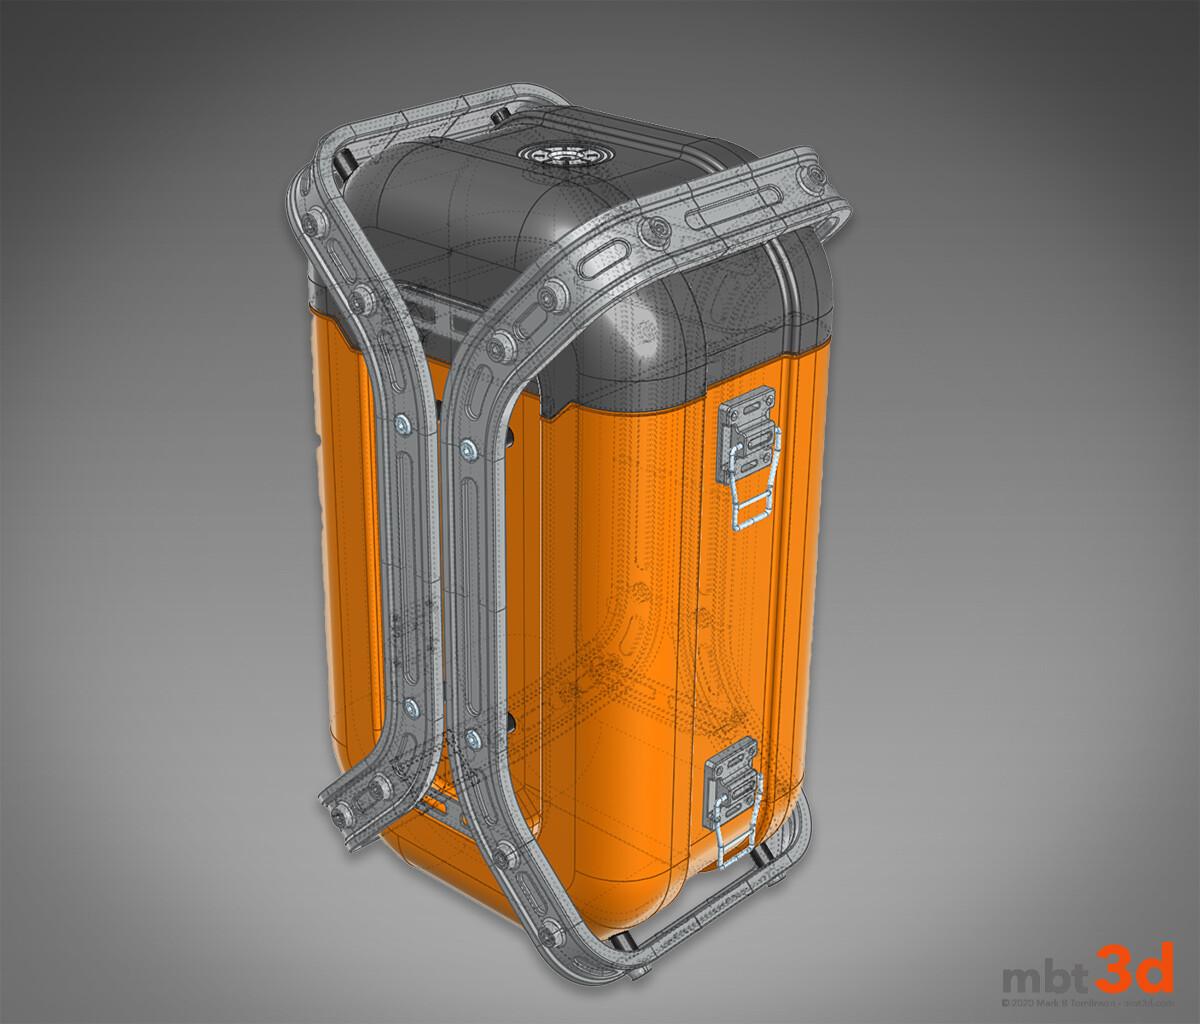 B-Box 1106: Moi3d Snapshot